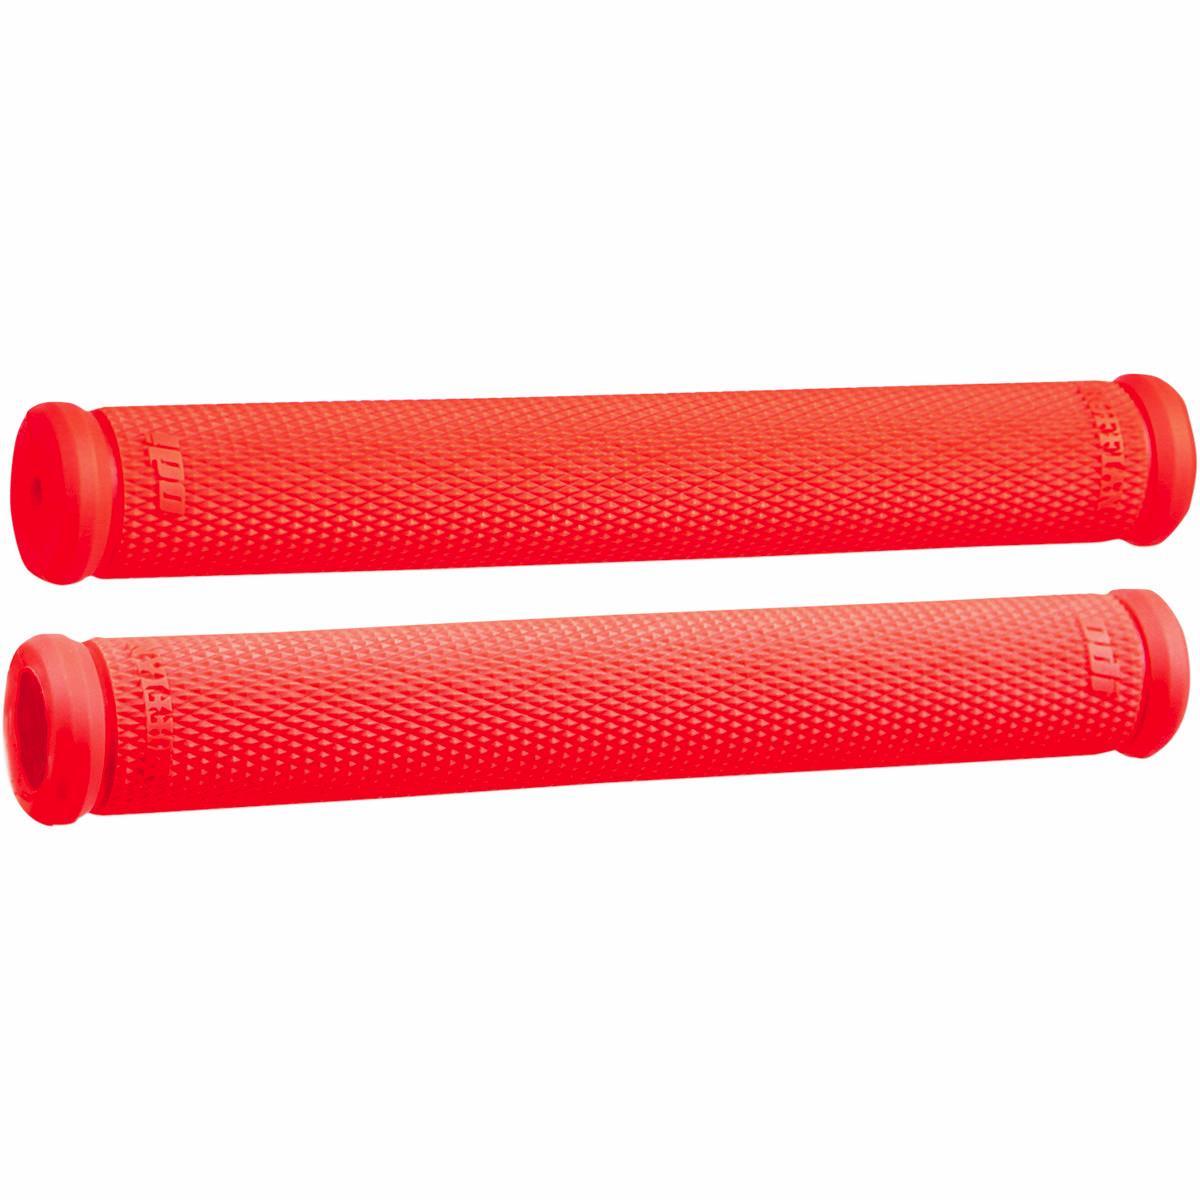 ODI N01RFFR Snow Ruffian Grips - Fire Red